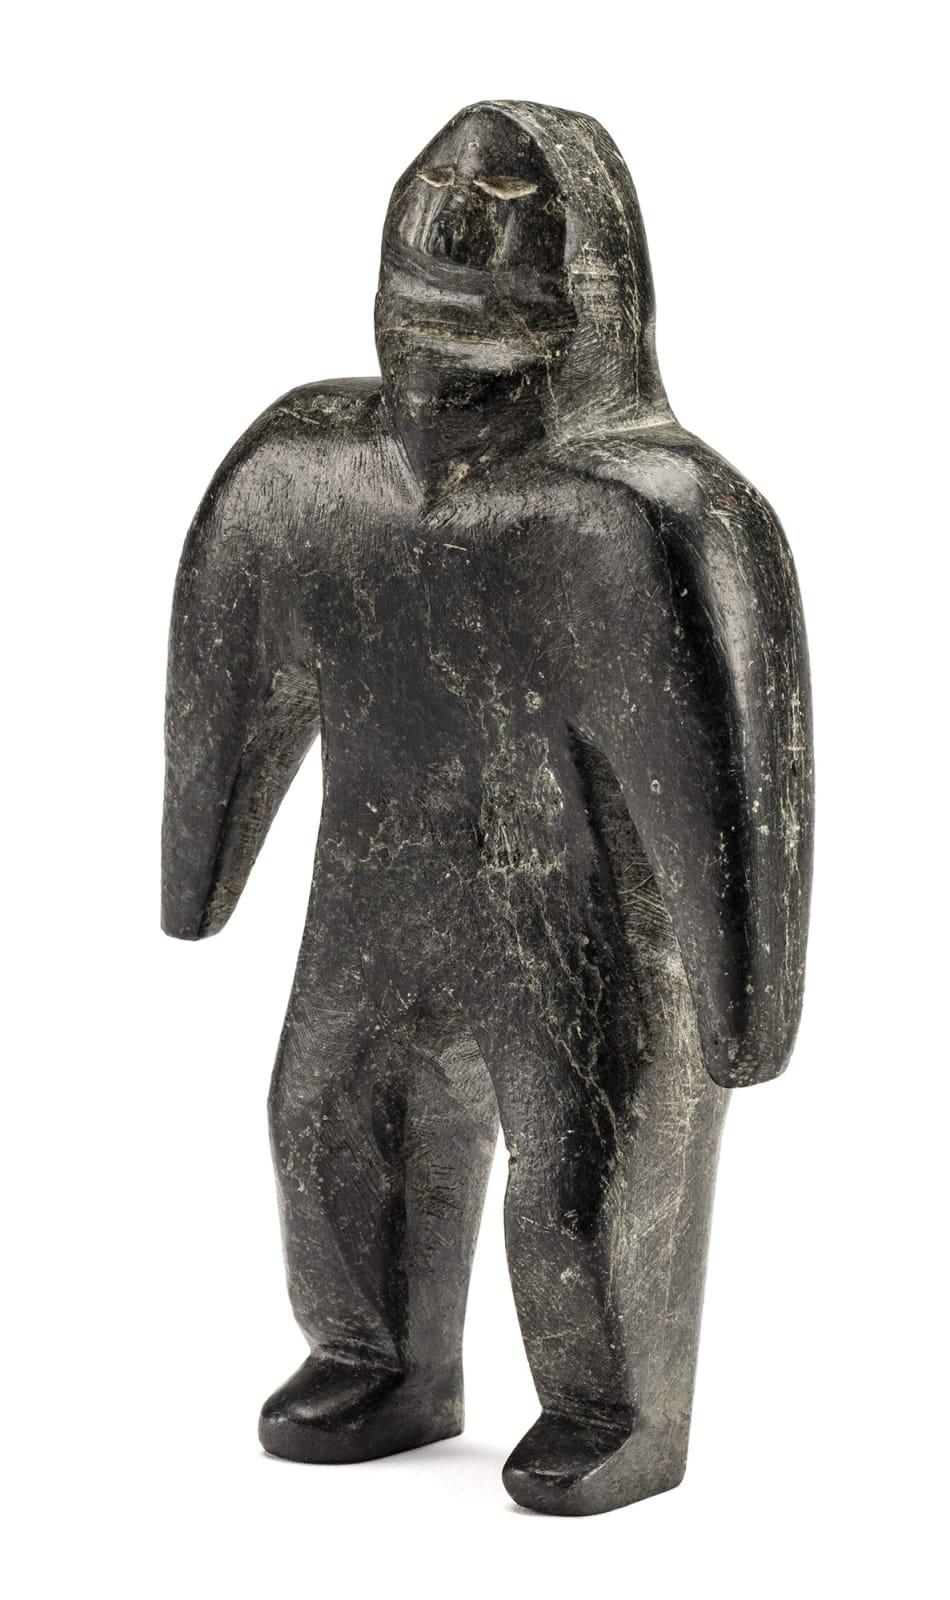 Lot 57 JOHN KAVIK (1897-1993) KANGIQLINIQ (RANKIN INLET) Standing Man, 1973 stone, 8.25 x 4.5 x 1.25 in (21 x 11.4 x 3.2 cm) Estimate: $4,000 — $6,000 Price realized: $3,840